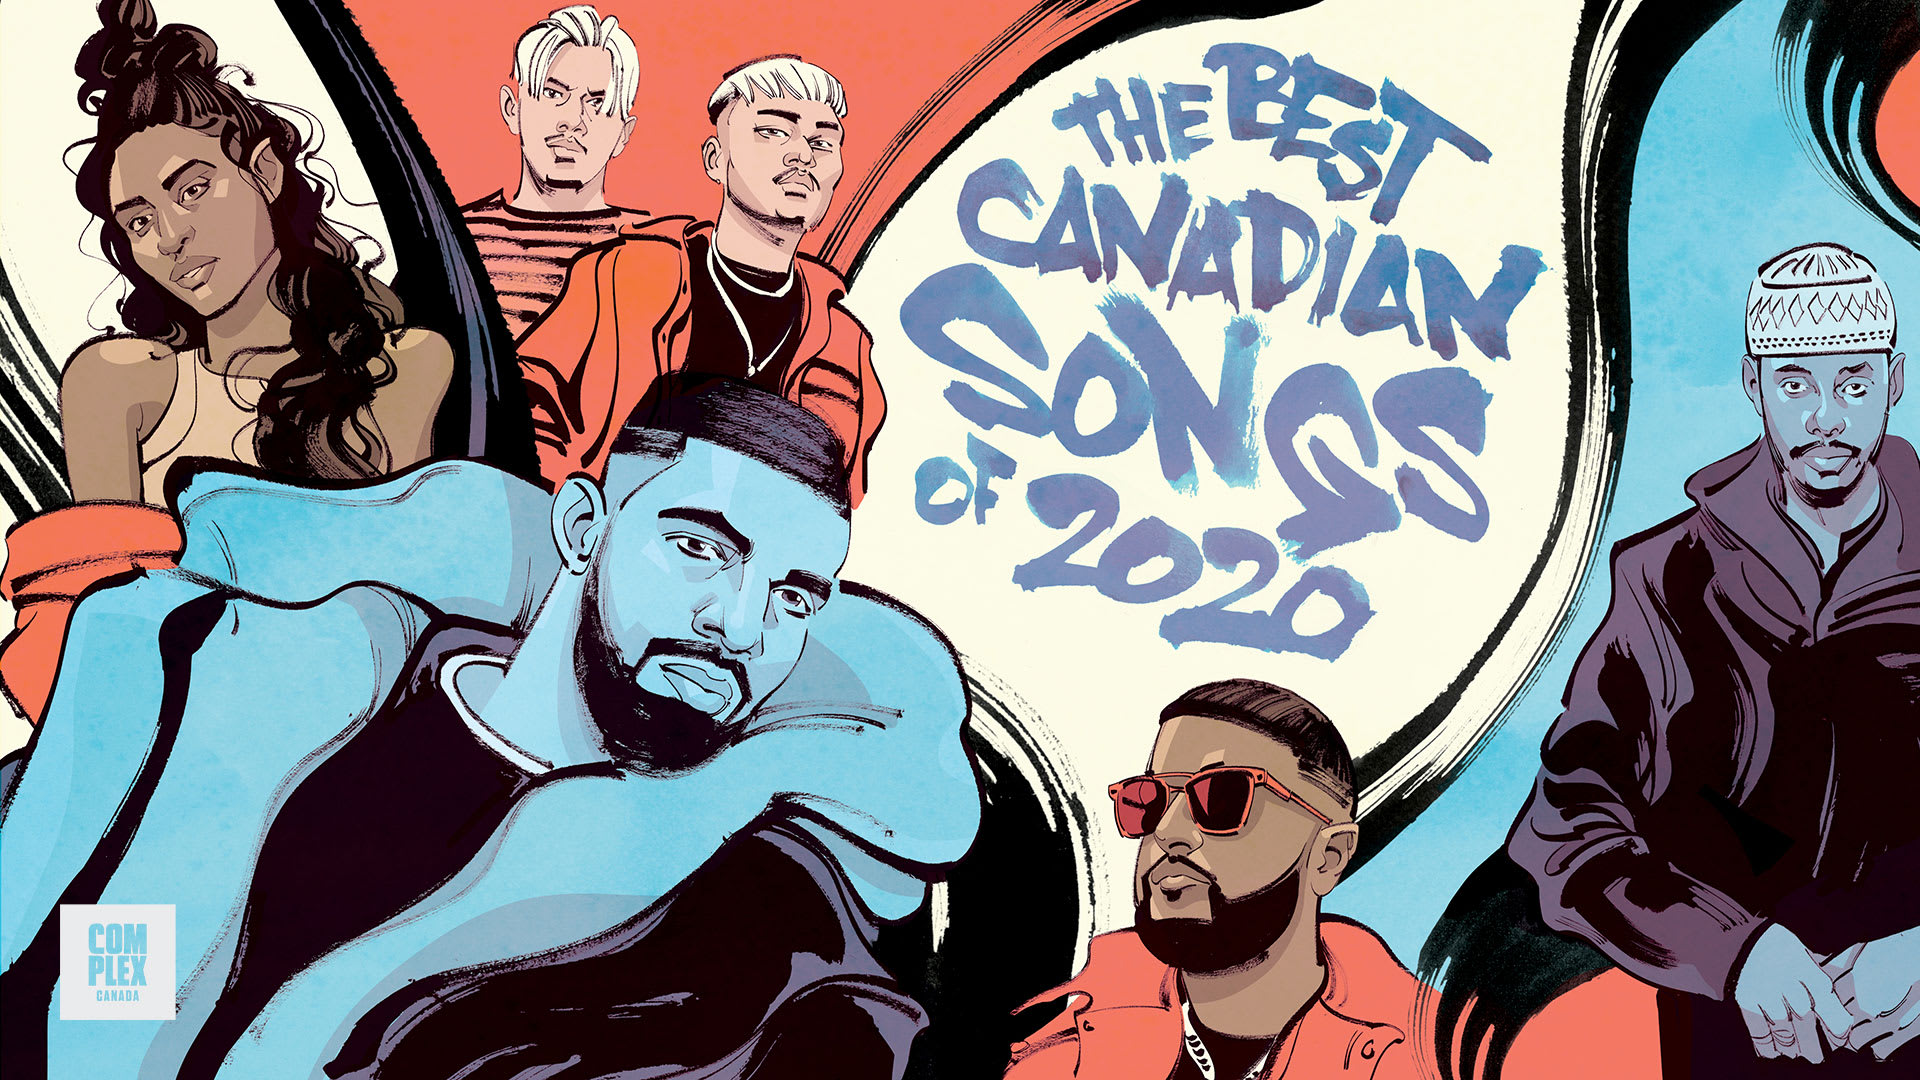 best canadian songs 2020 drake nav mustafa manila grey jessie reyez